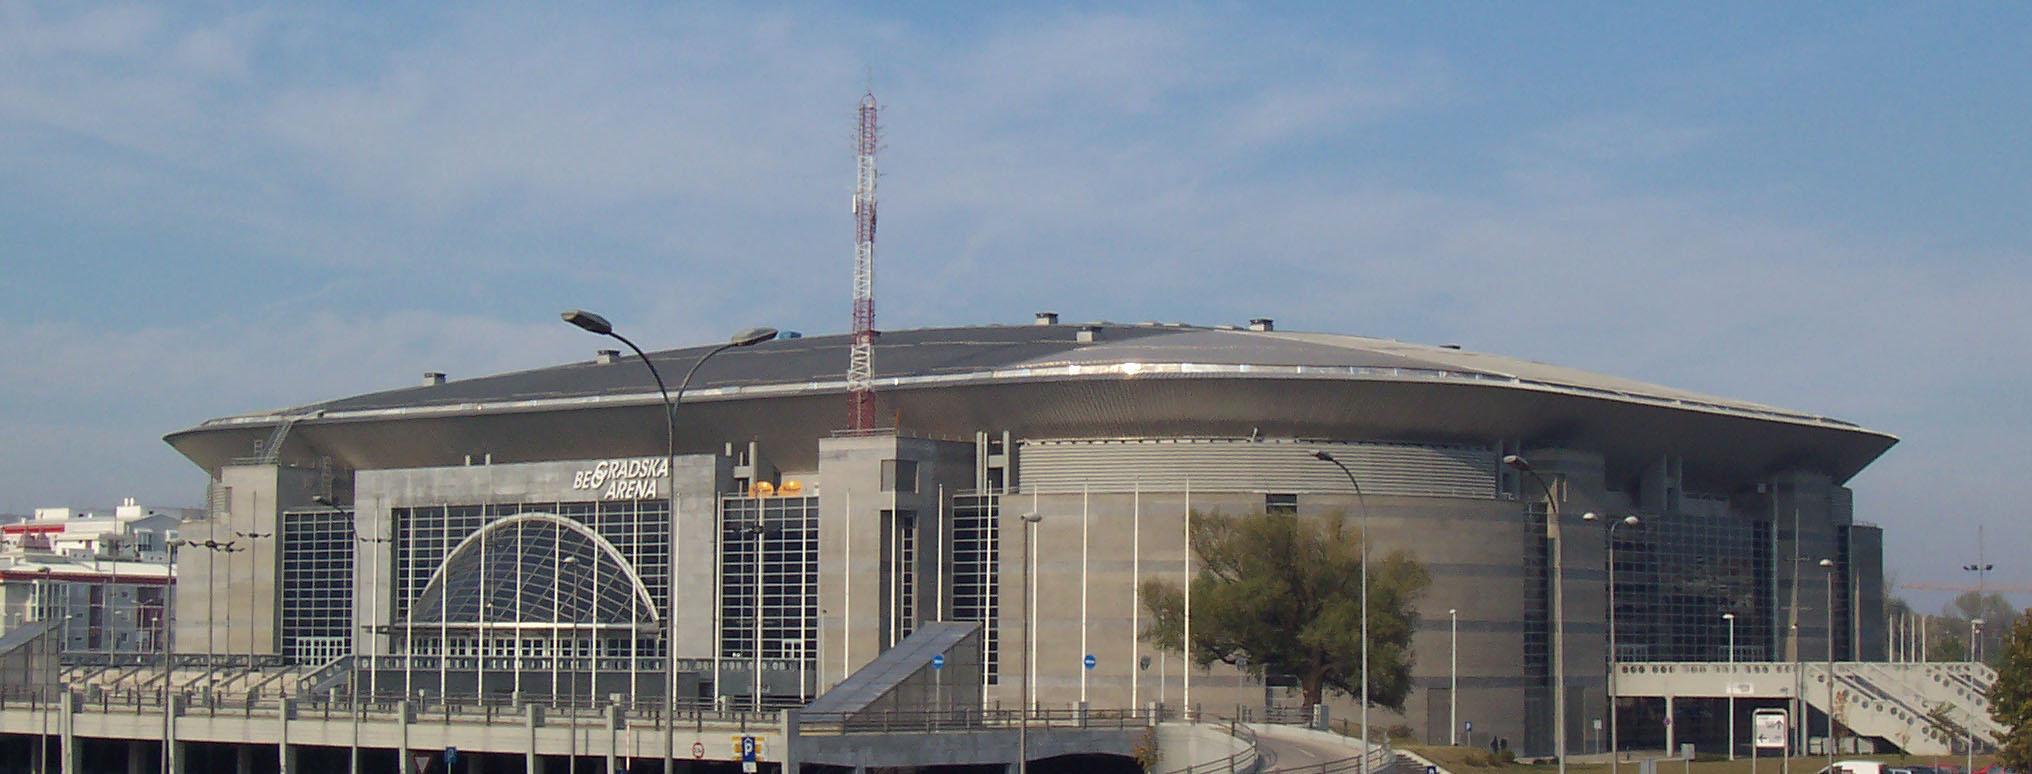 Атина, Белград, Каунас и Келн меѓу кандидатите за домаќин на последната фаза на Евролигата